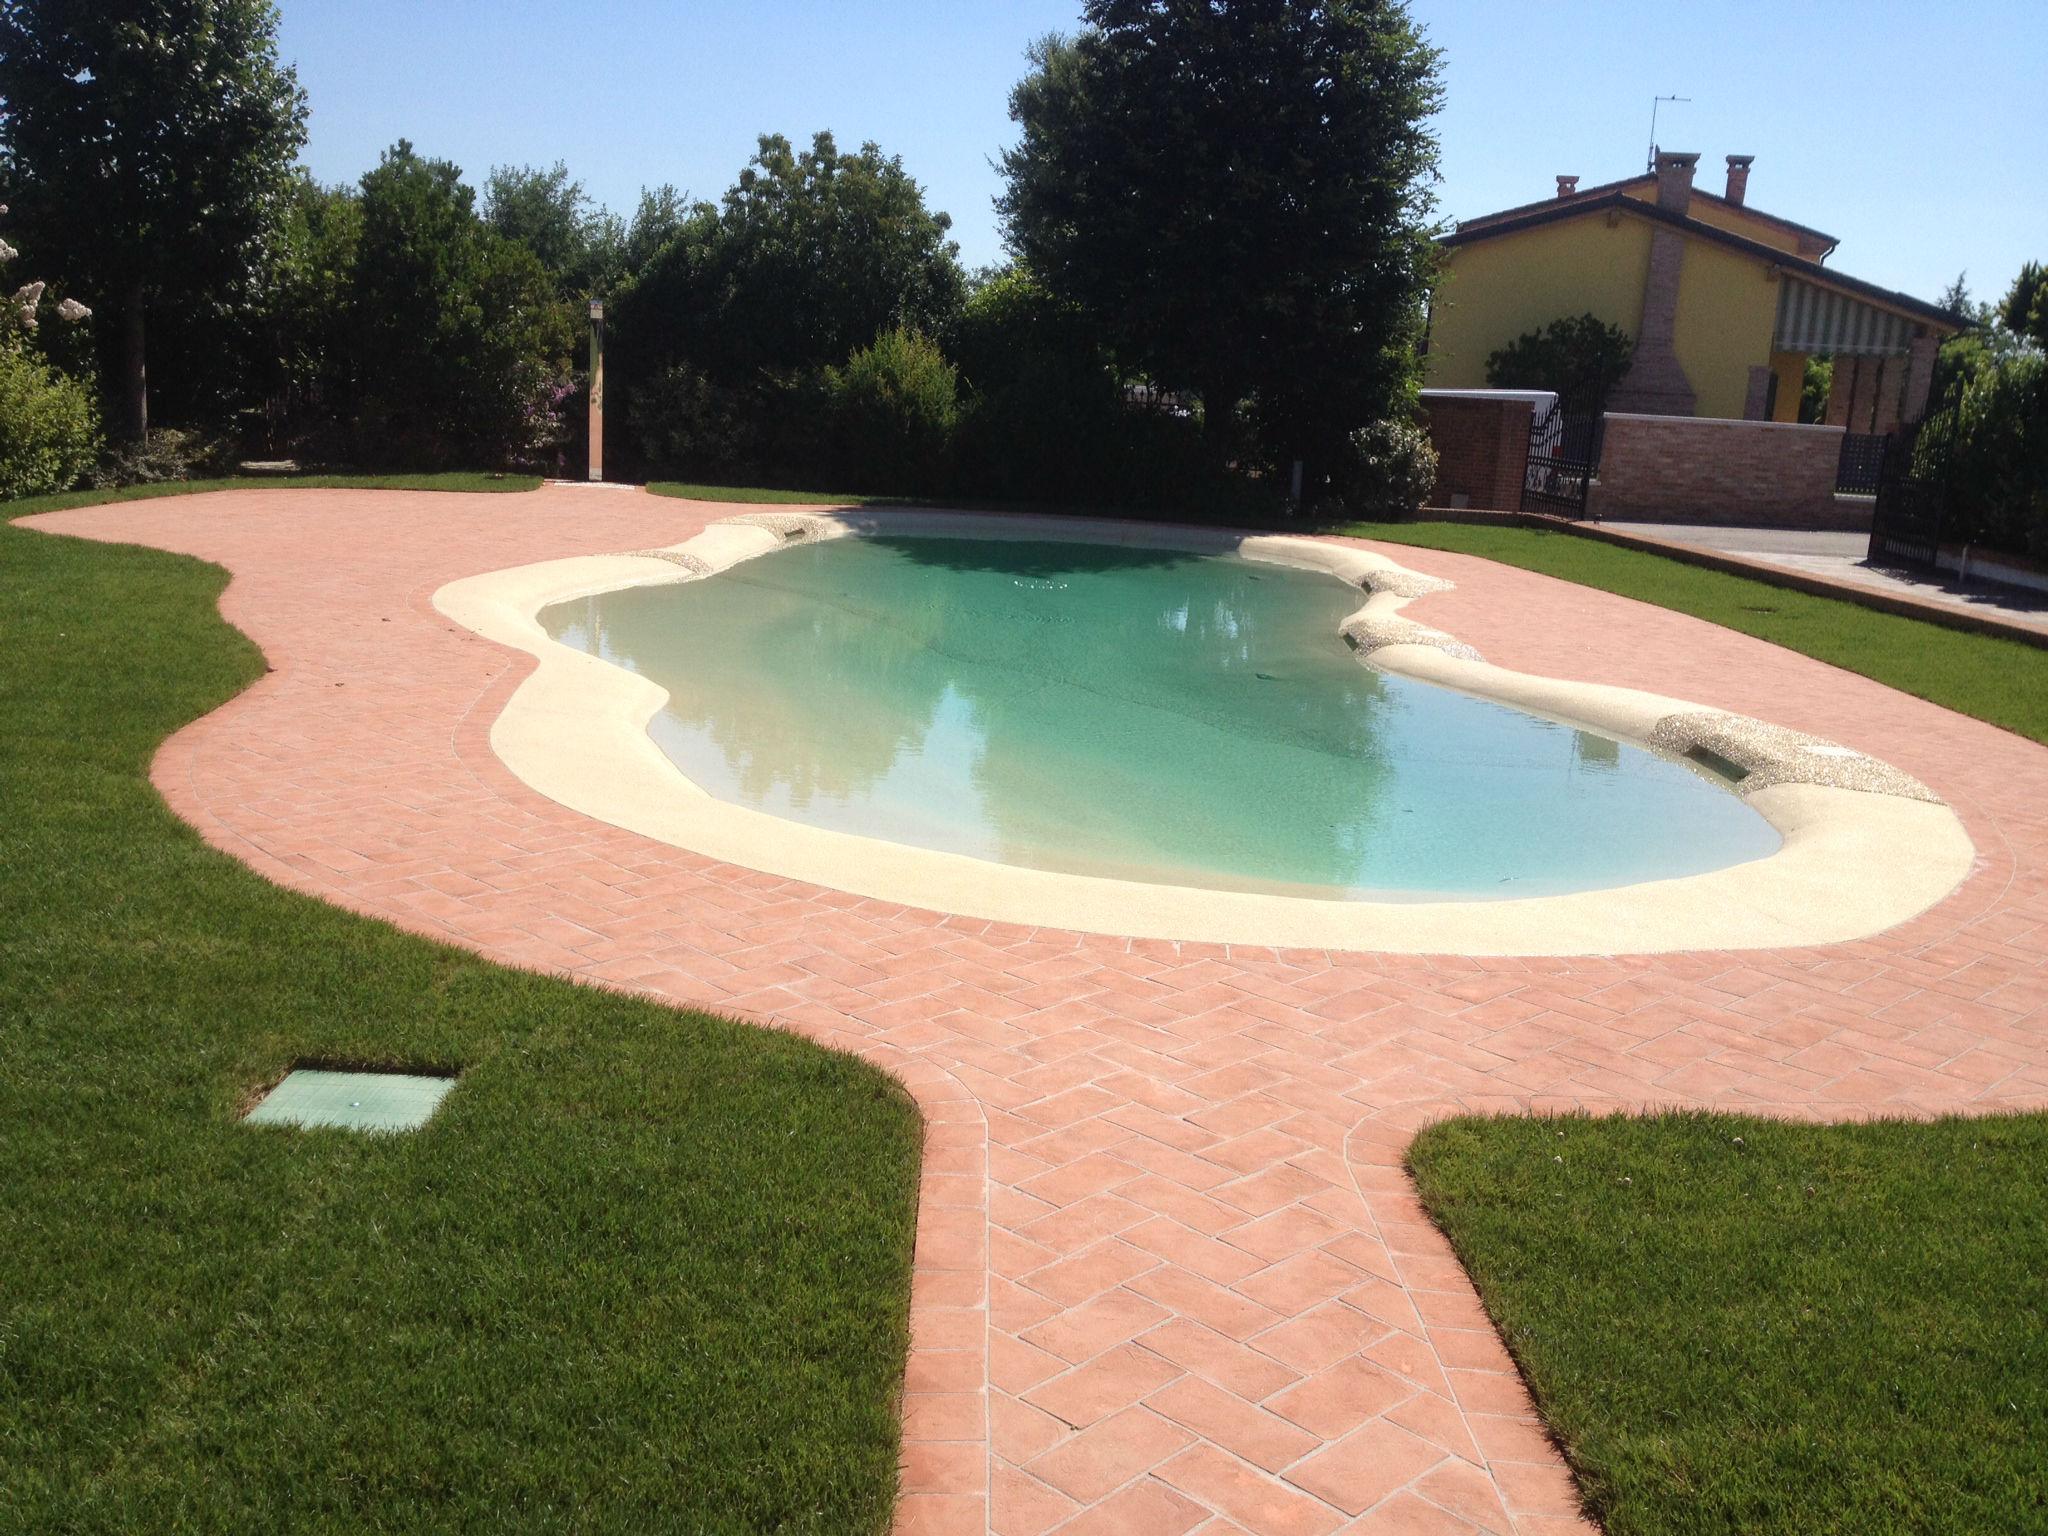 8 Flooring Tiles in Pakistan How to Lay Floor Tiles Swimming Pool Tiles Designs Images.